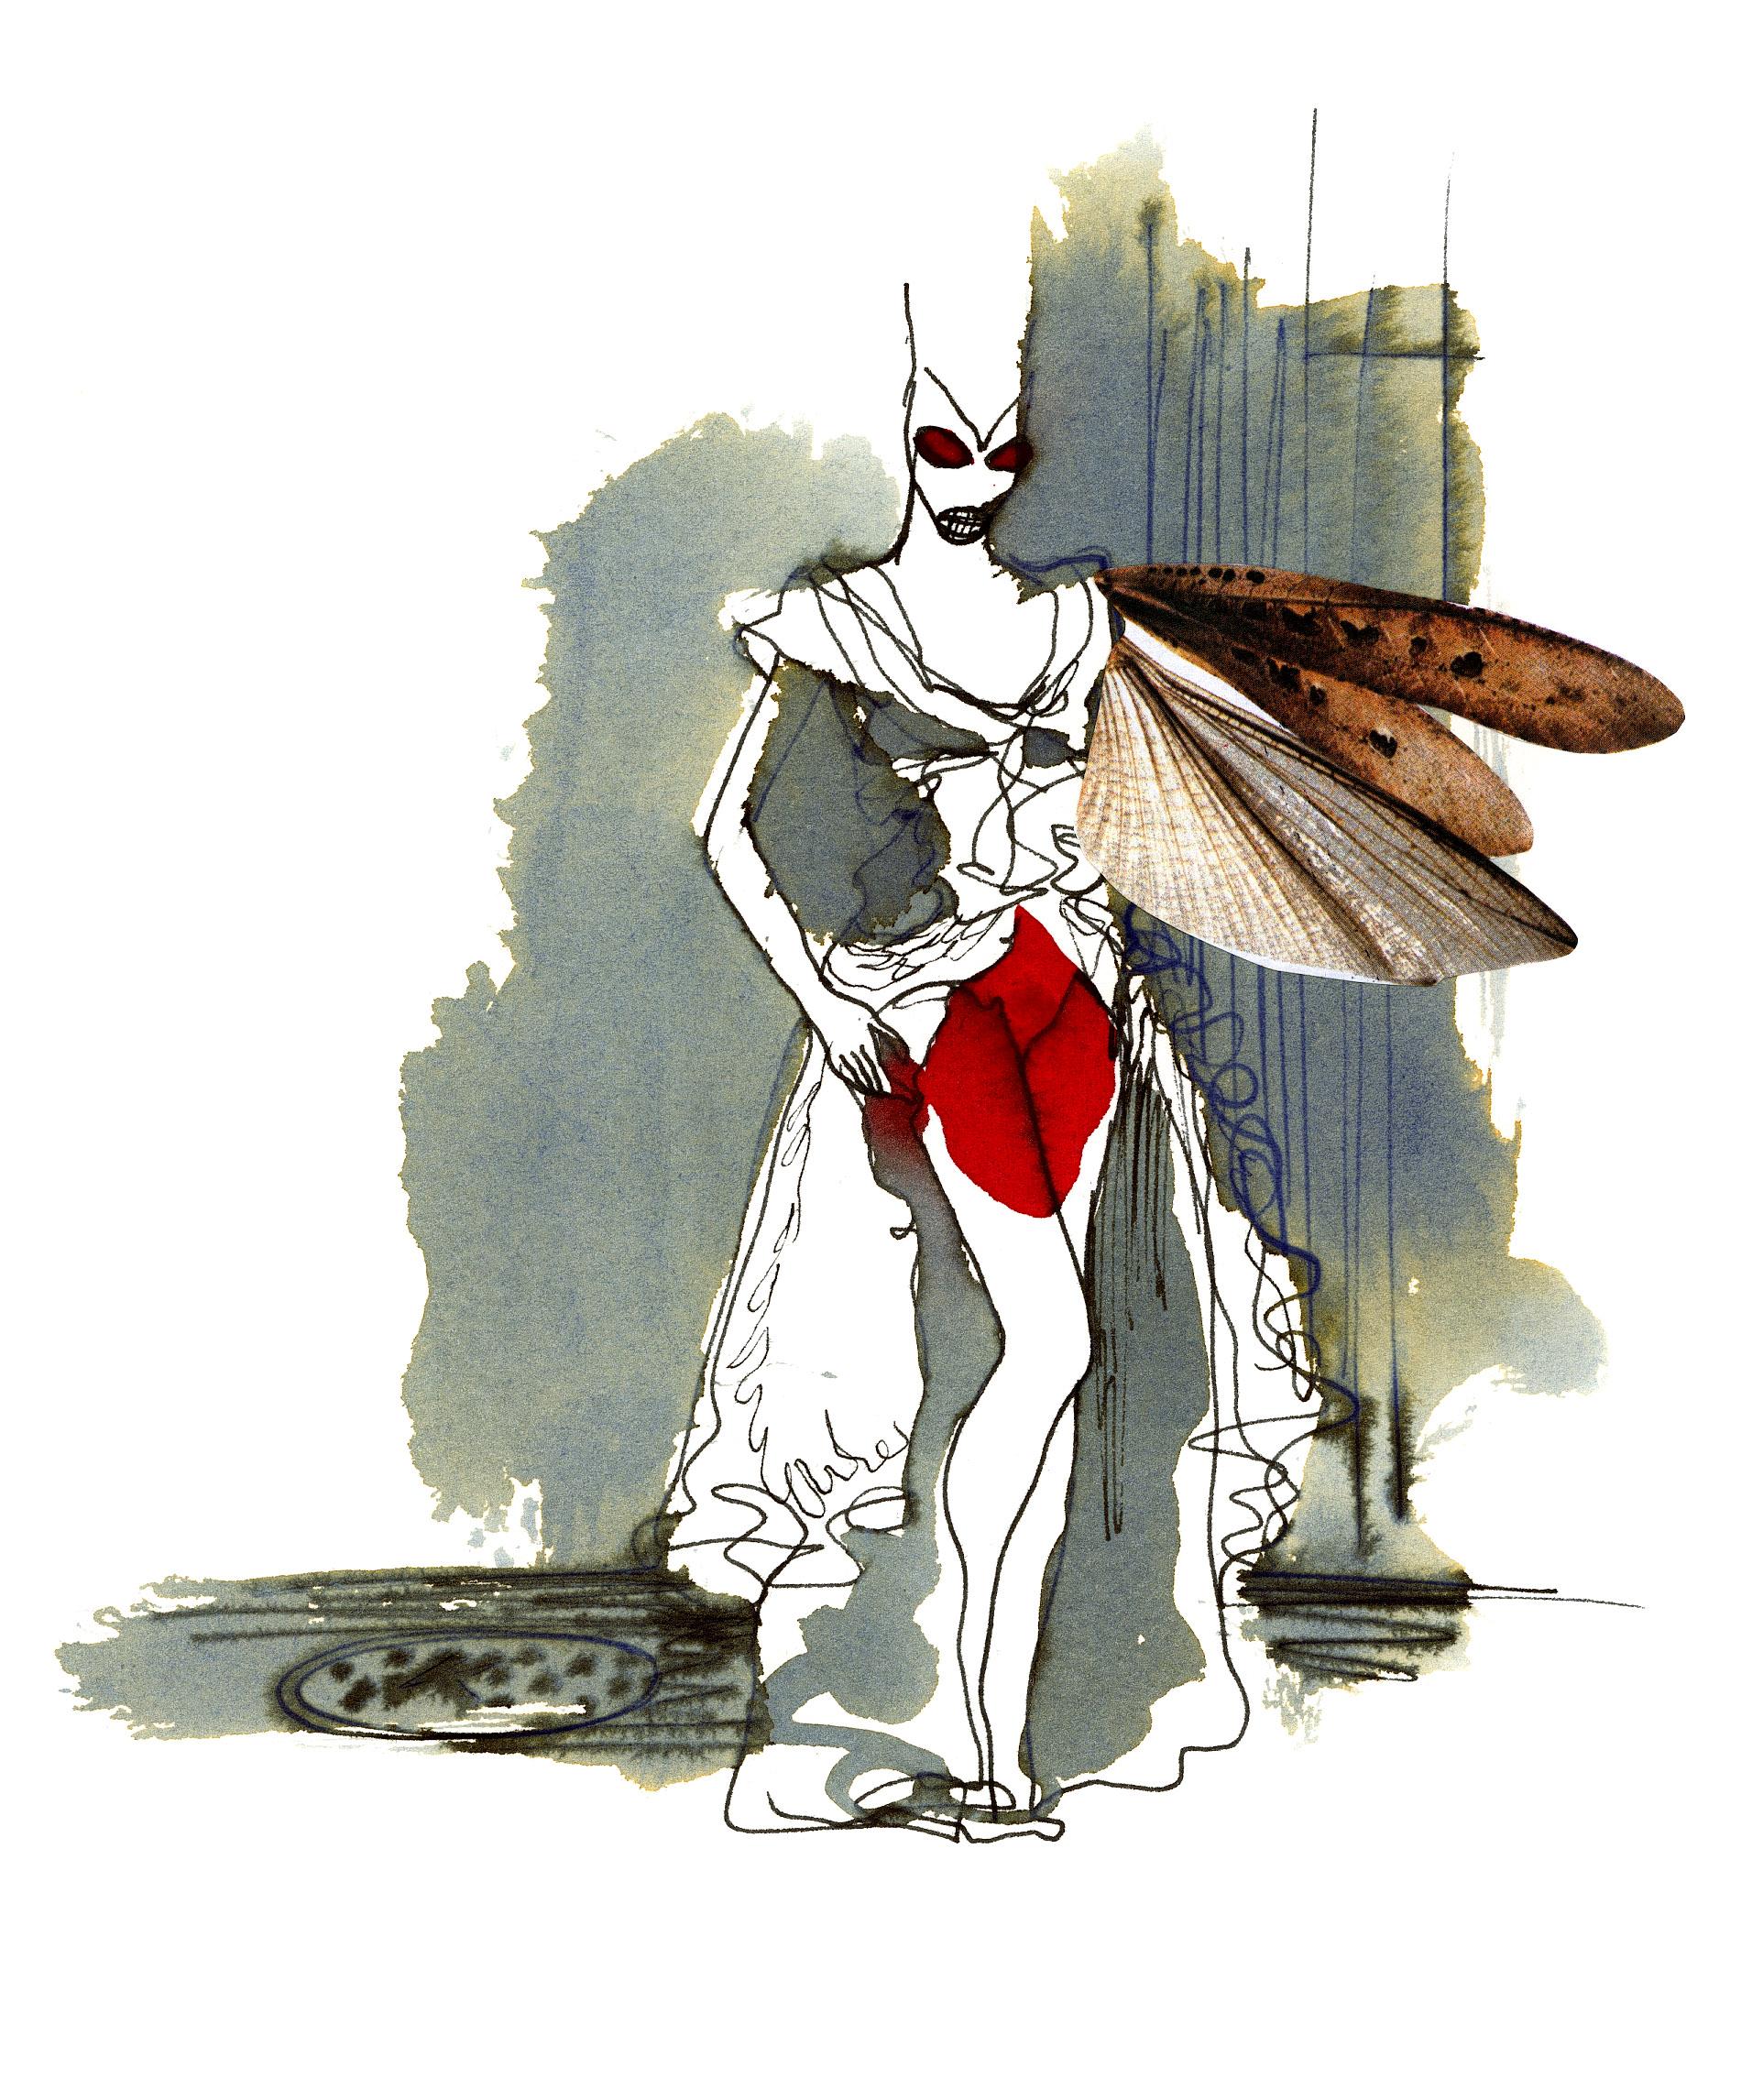 insektsmode3.jpg